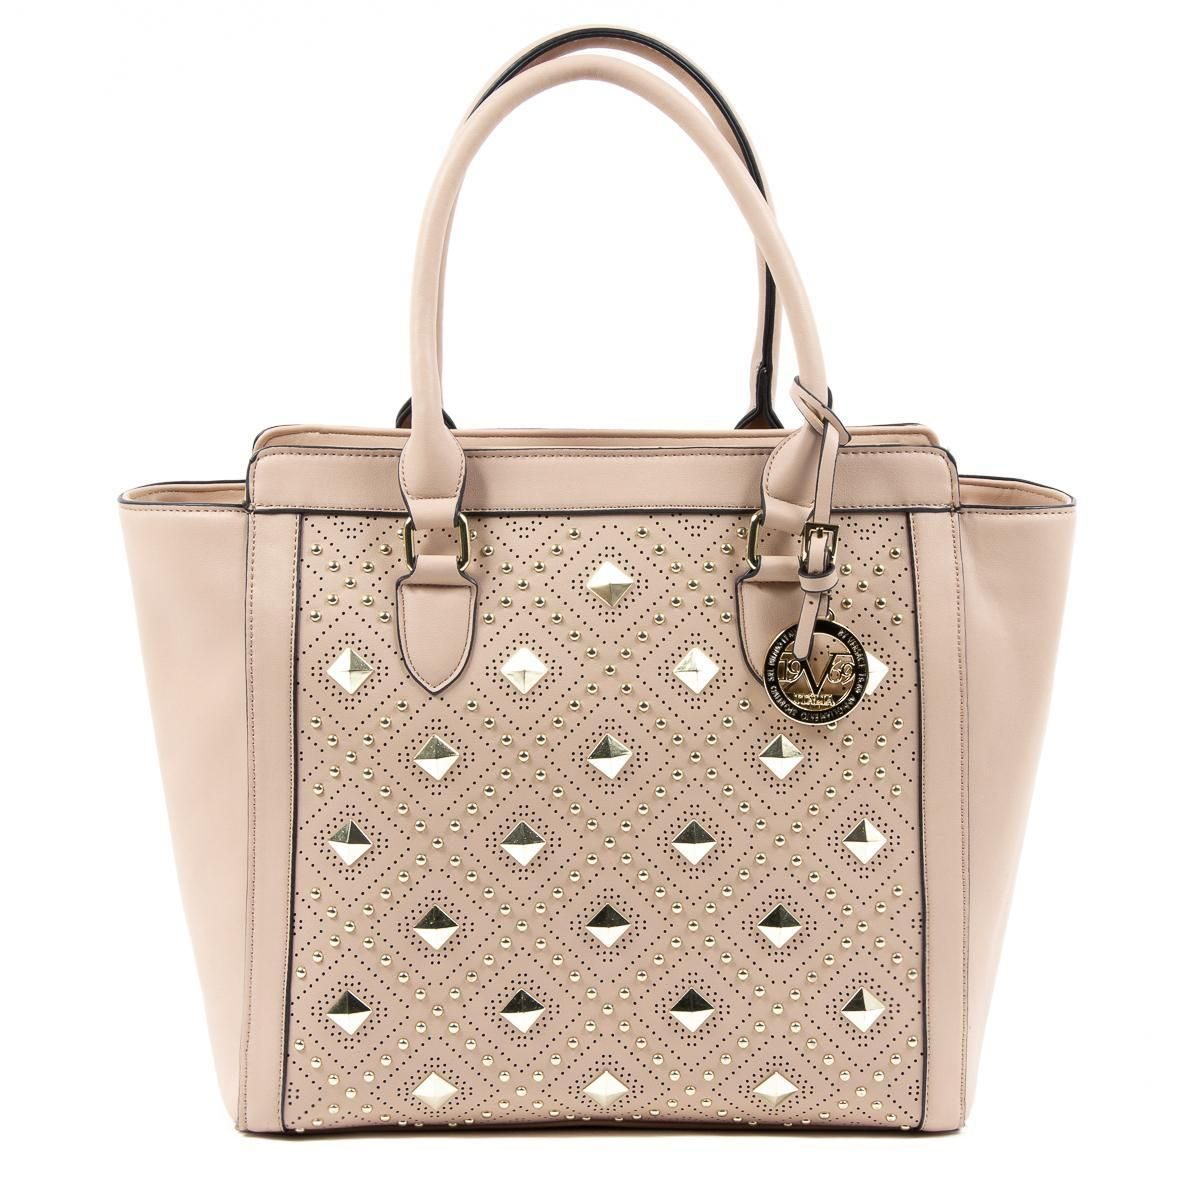 191974d39b61 V 1969 Italia Womens Handbag Pink ROBERTA - Handbags   Purses